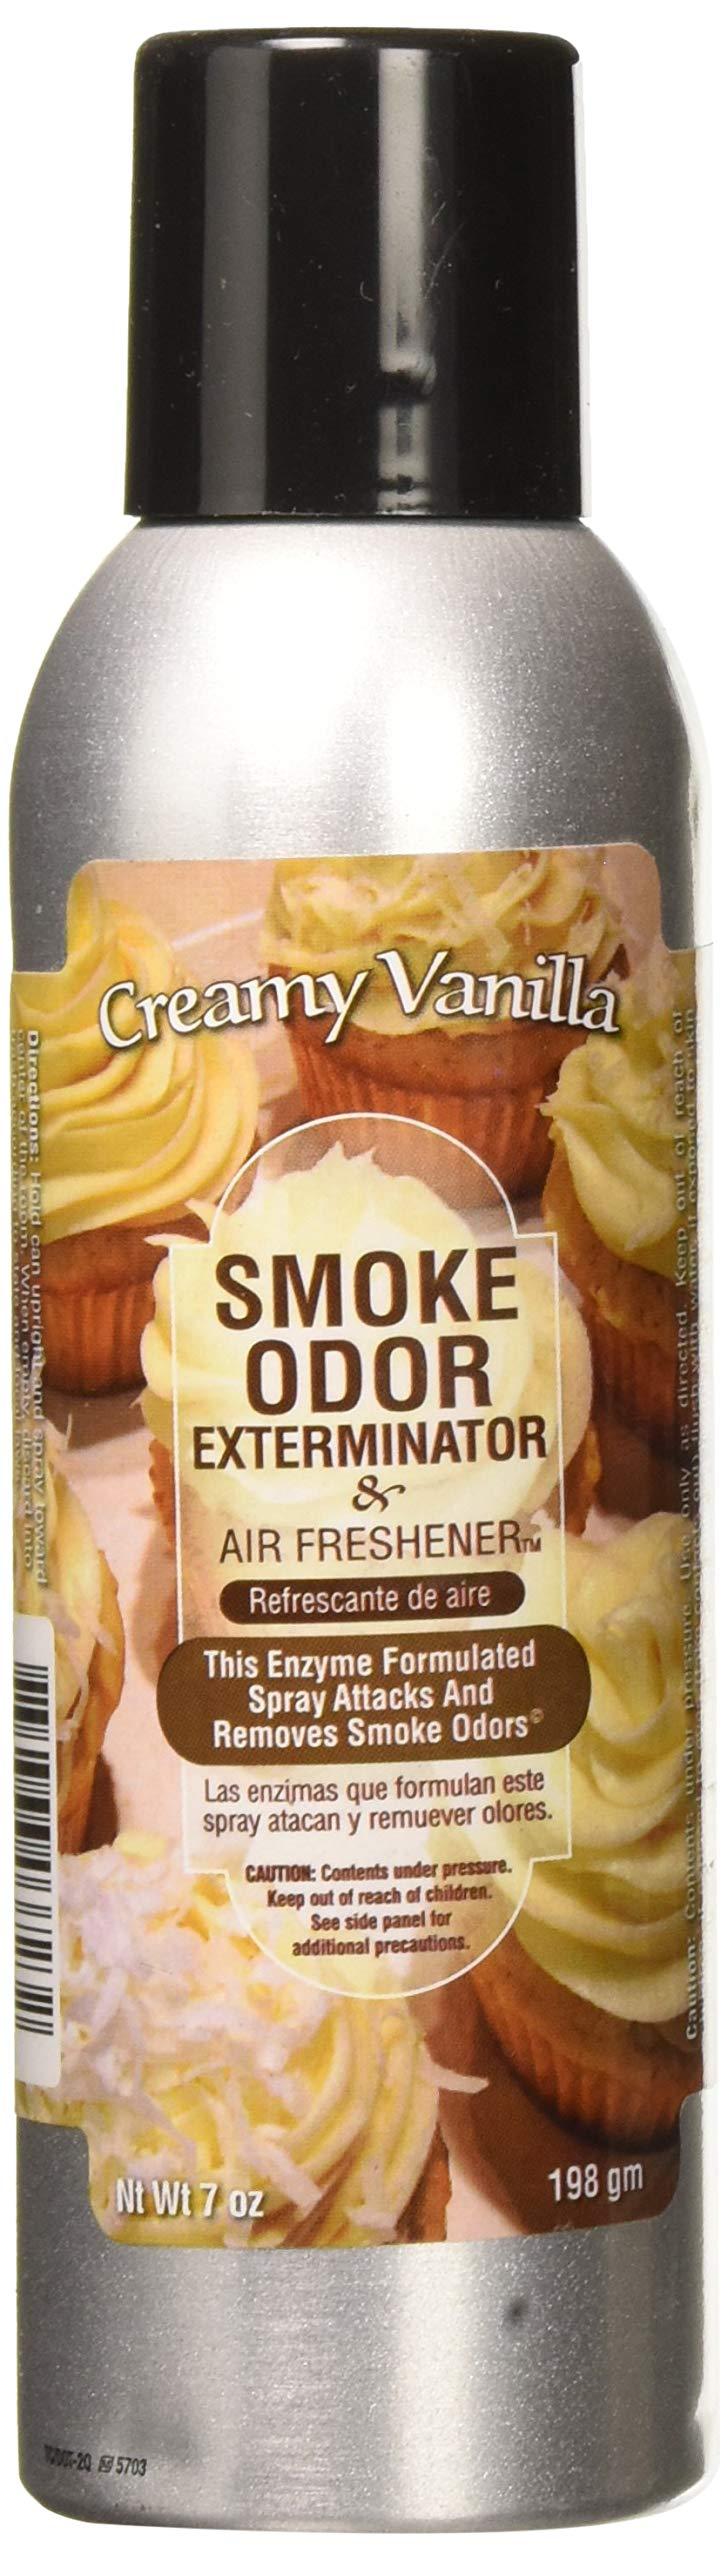 Tobacco Outlet Products Smoke Odor Exterminator, 7 Ounce (Creamy Vanilla)